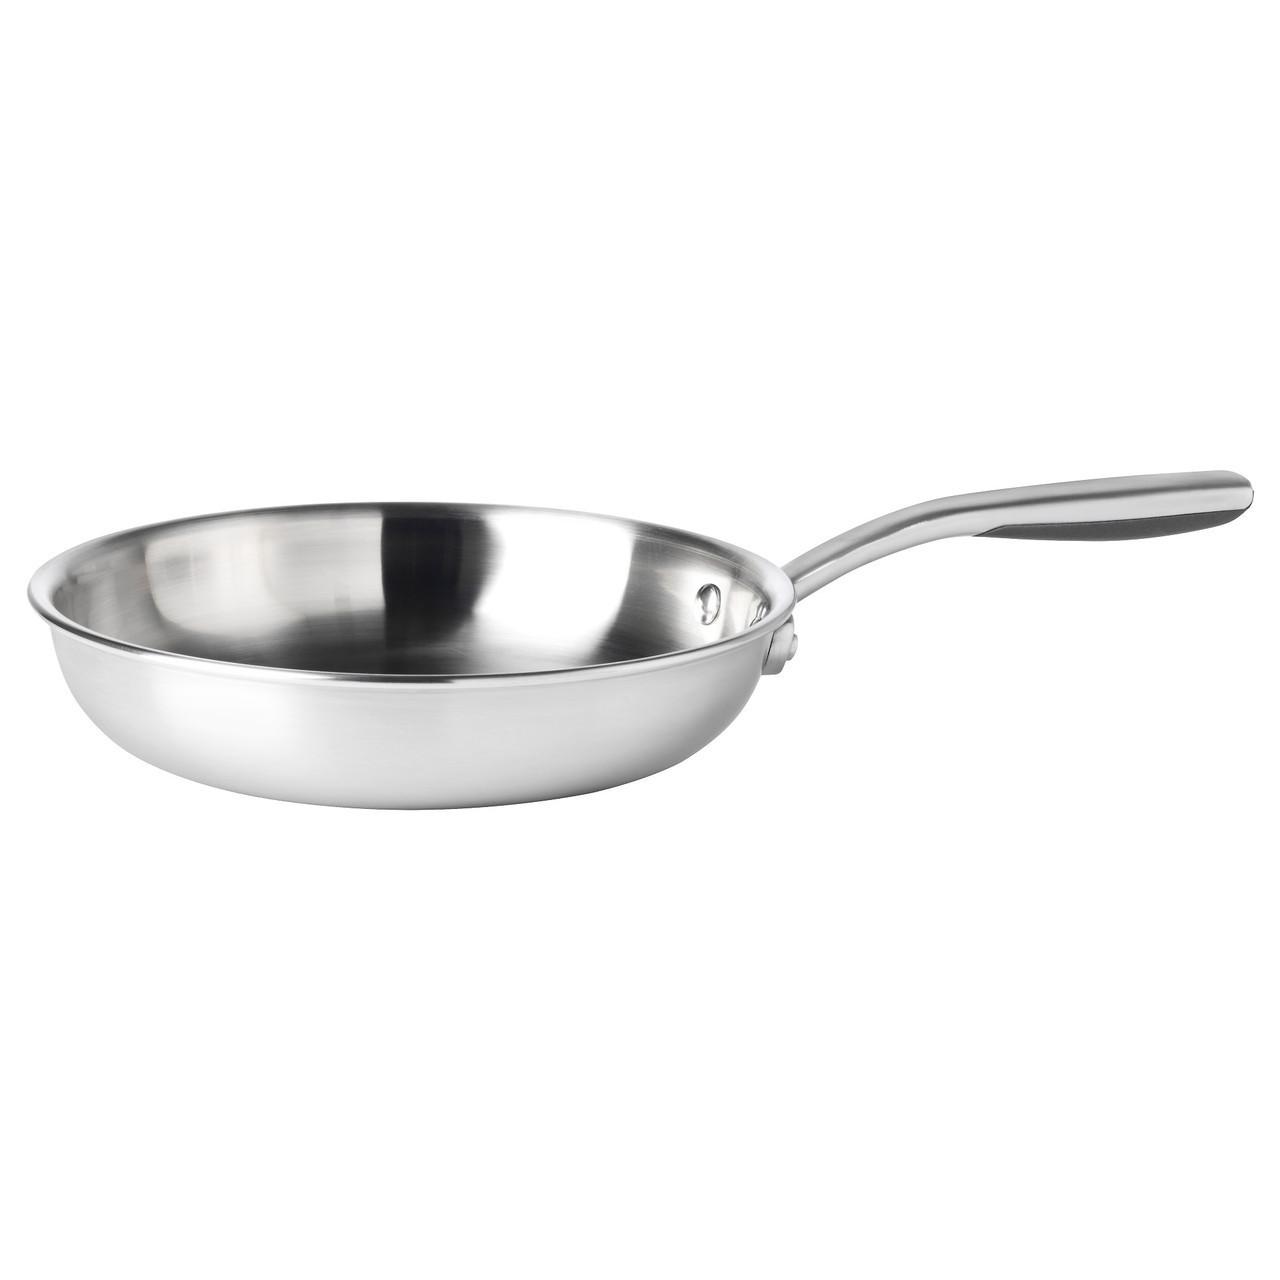 SENSUELL Сковорода, нержавеющ сталь, серый 803.245.43